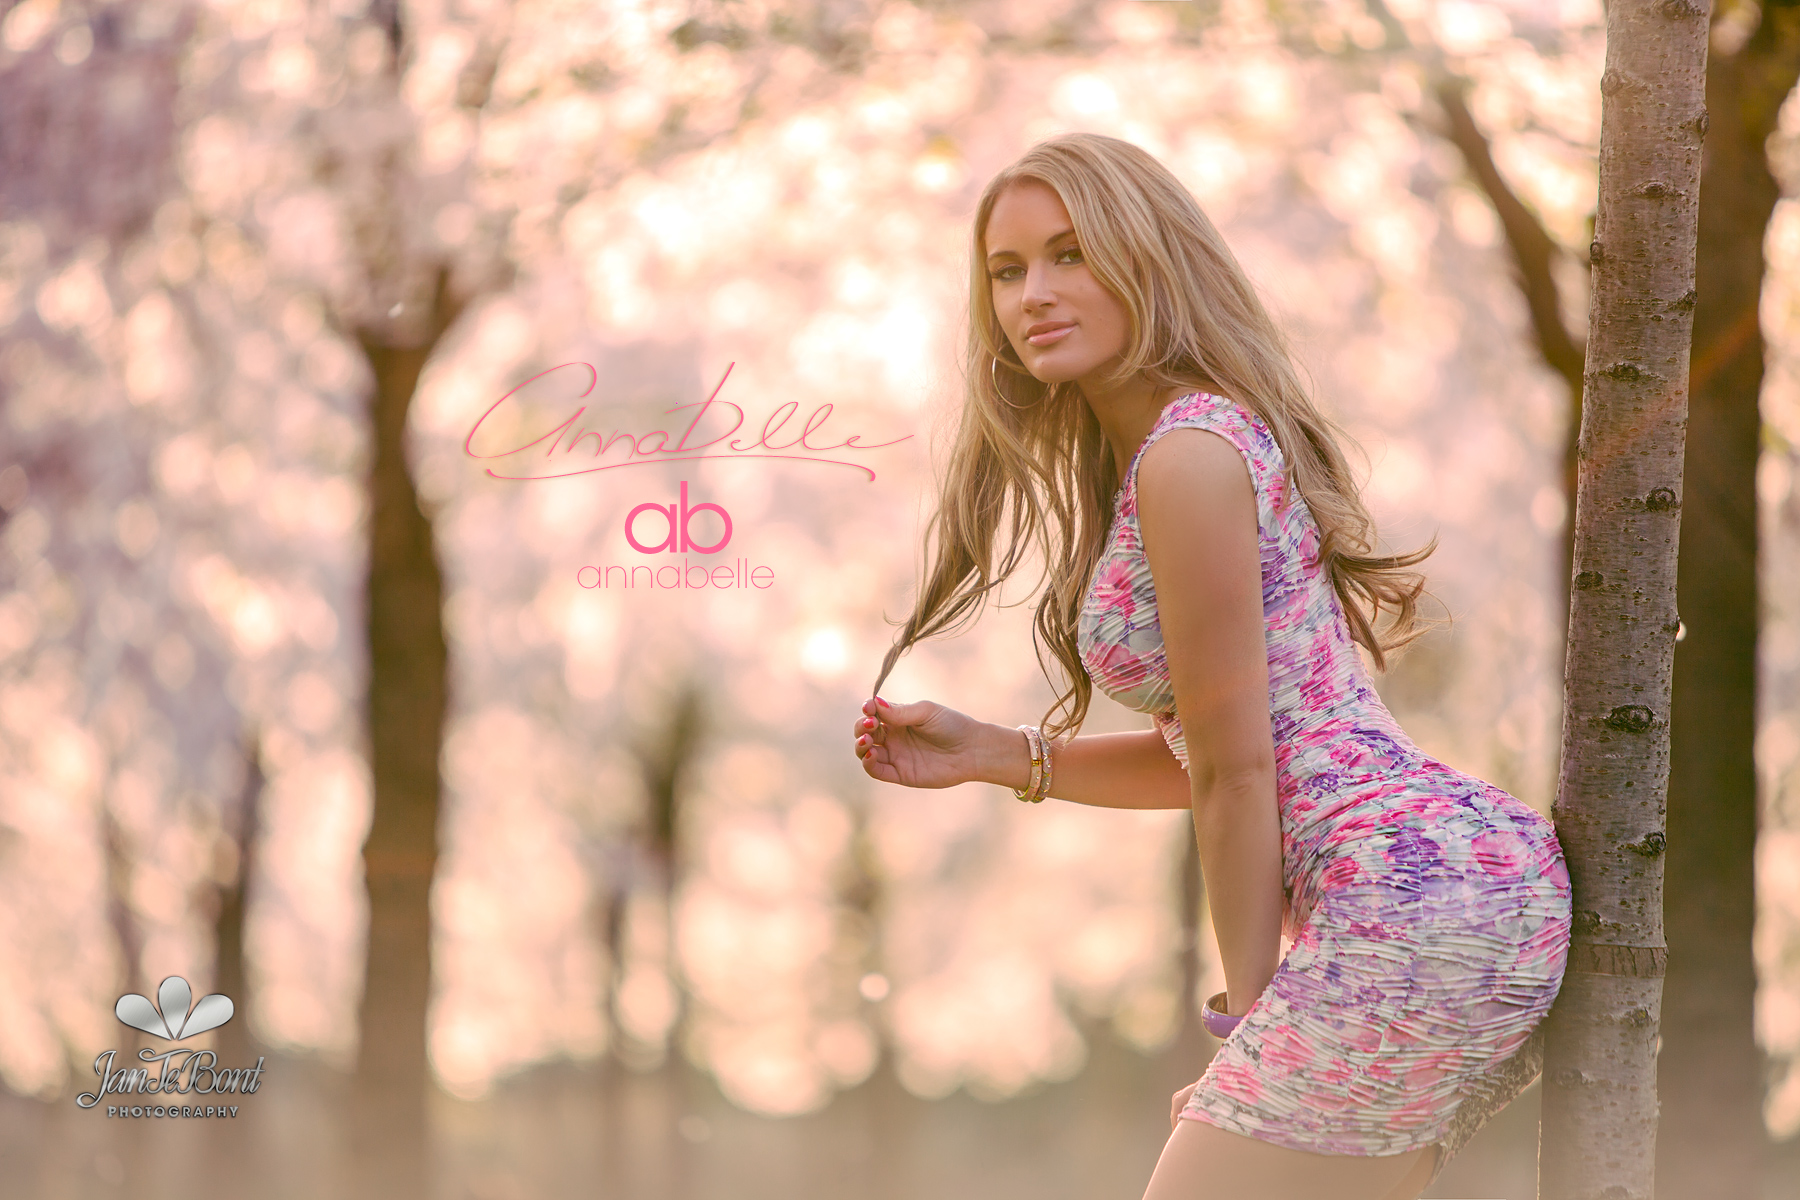 Annabelle La Belle jan de bont jan te bont jtb models glamour models europe european